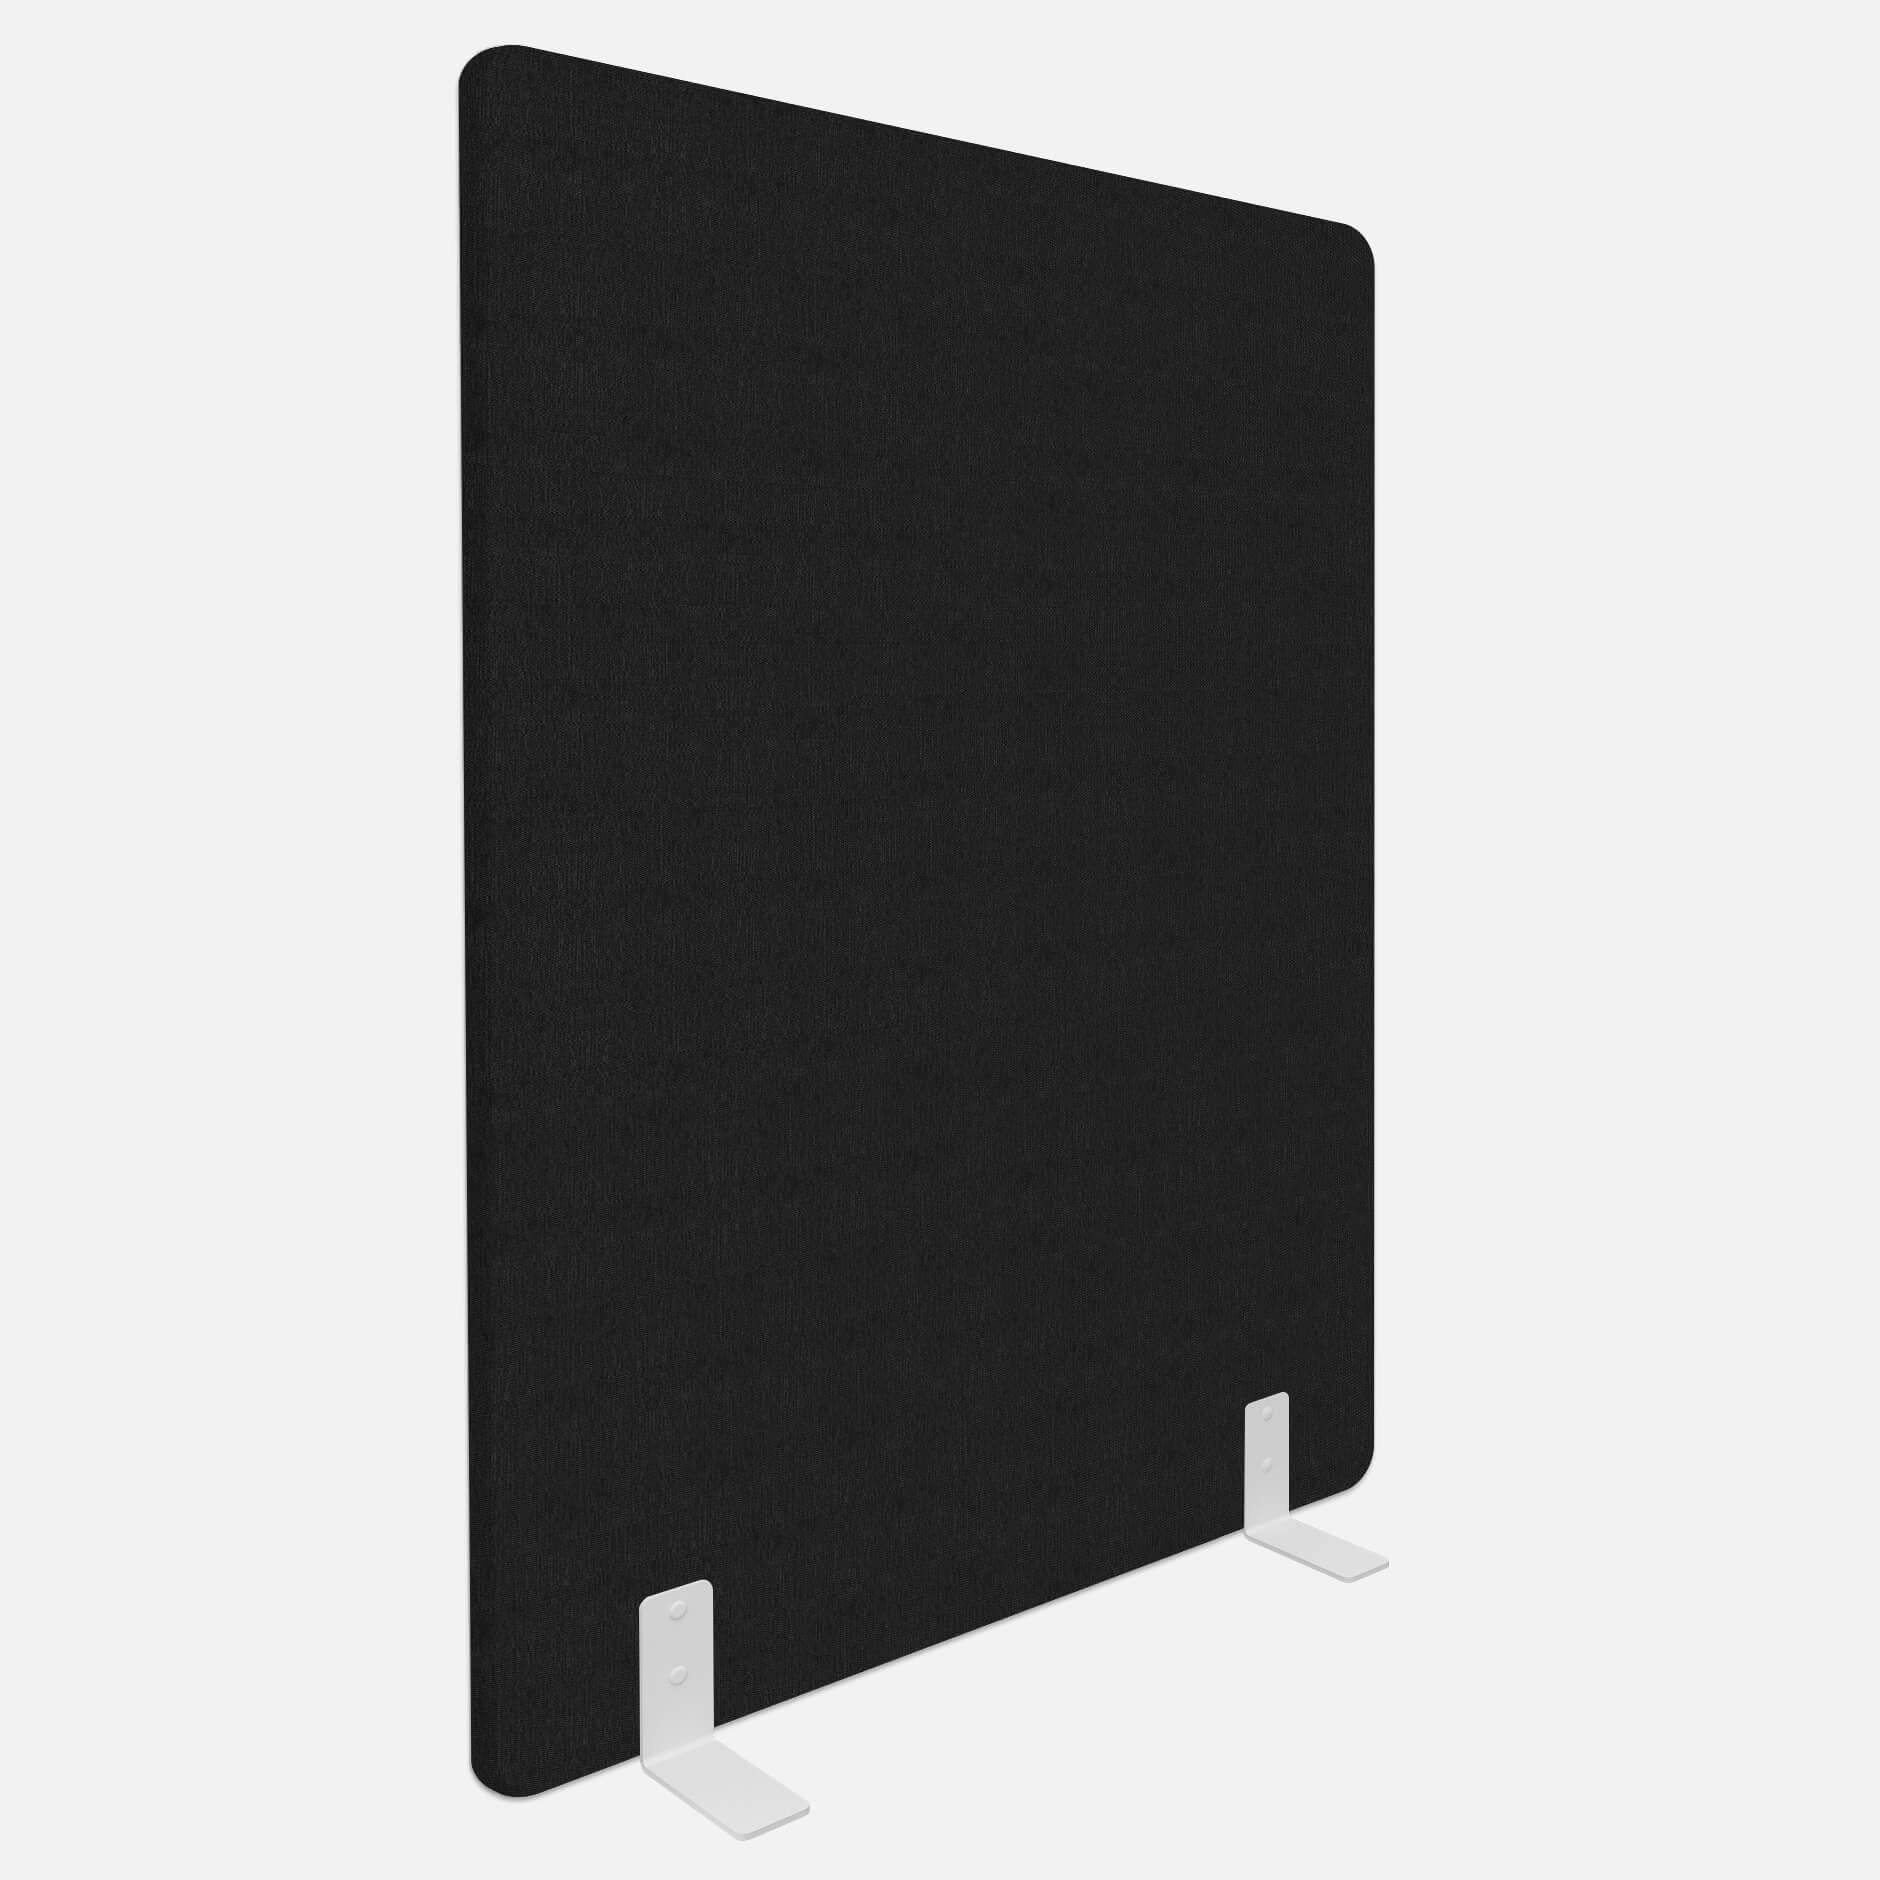 Stellwand Flexible Trennwand FREE STANDING Sichtschutz Lärmschutz Schallabsorbierend Raumteiler Akustik BERTA